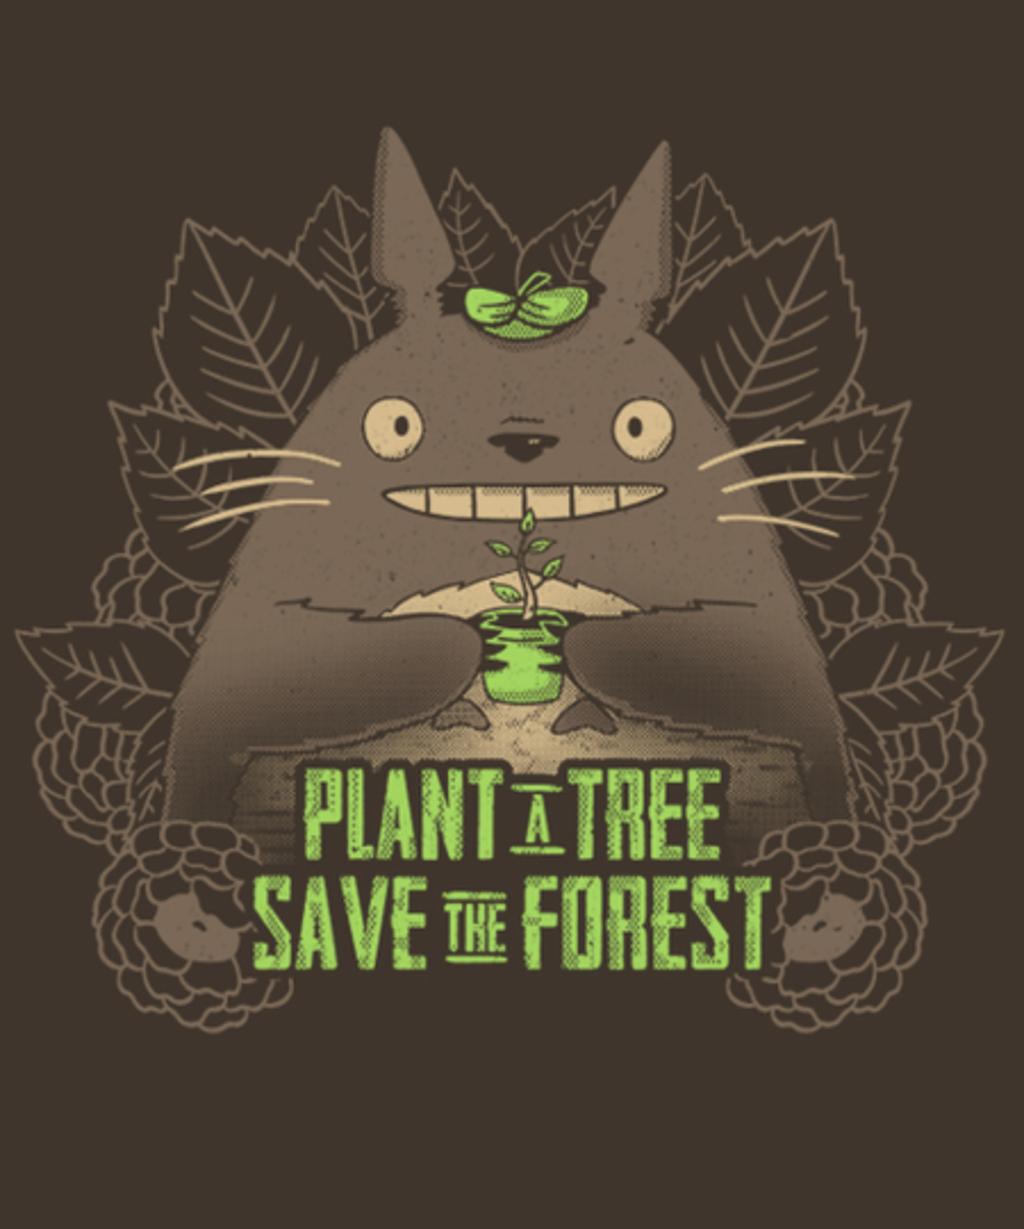 Qwertee: Plant a Tree